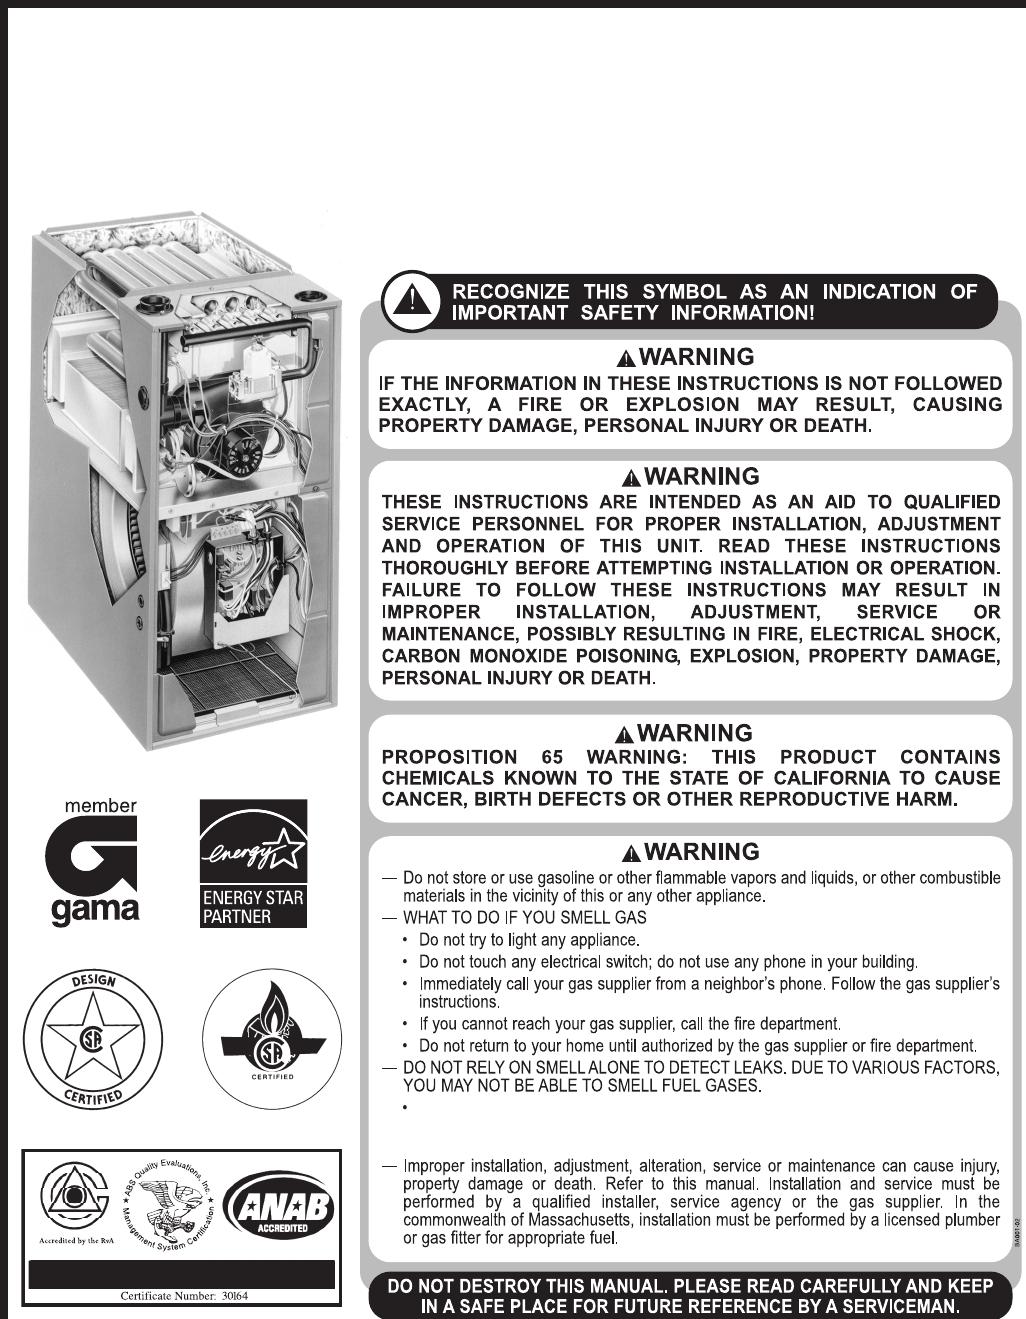 heat controller glub 95 series quick start guide 92 24161 37 11 fre